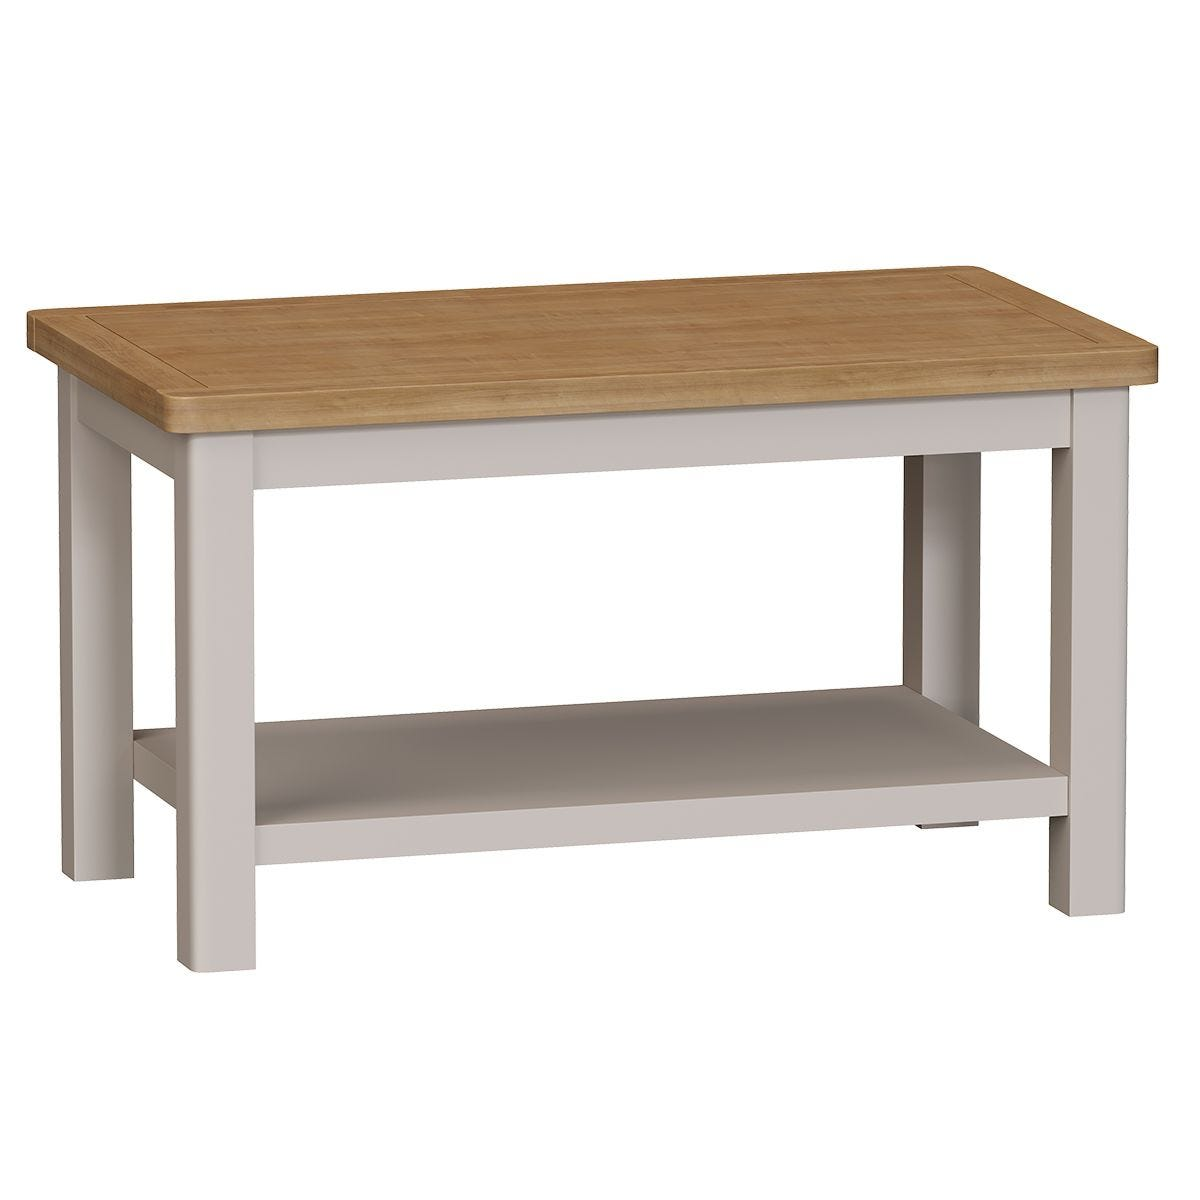 Elmridge Small Coffee Table